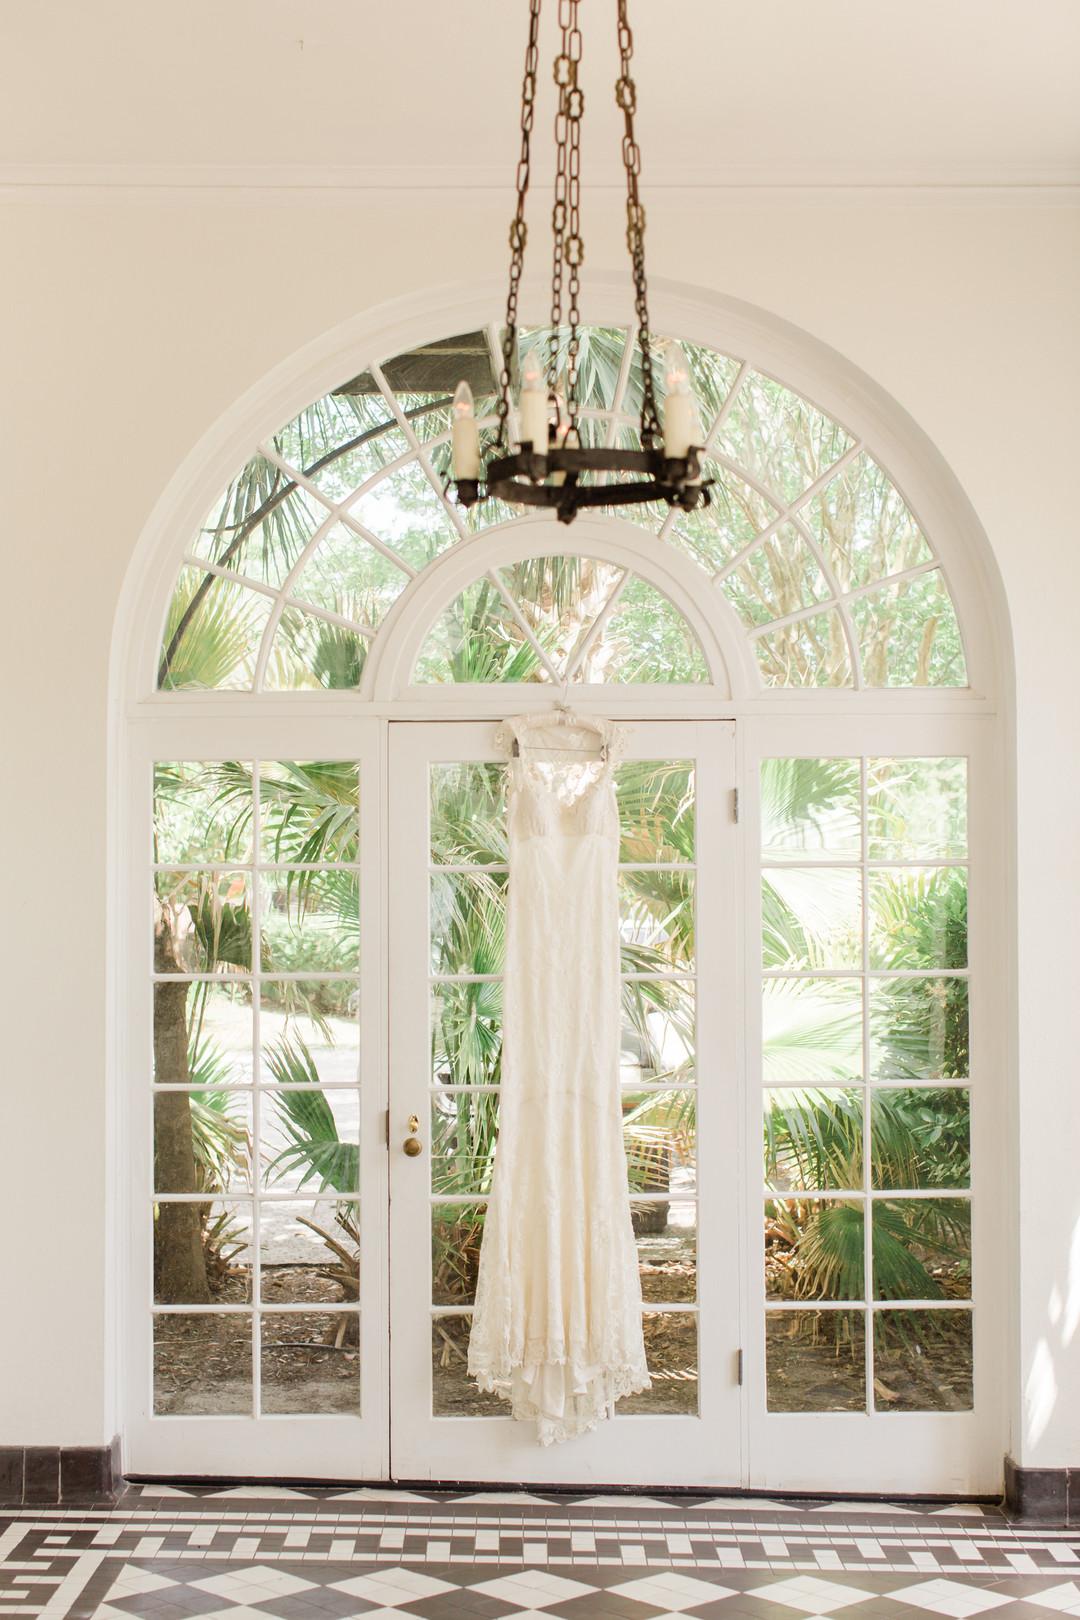 lowndes-grove-plantation-wedding-16.jpg